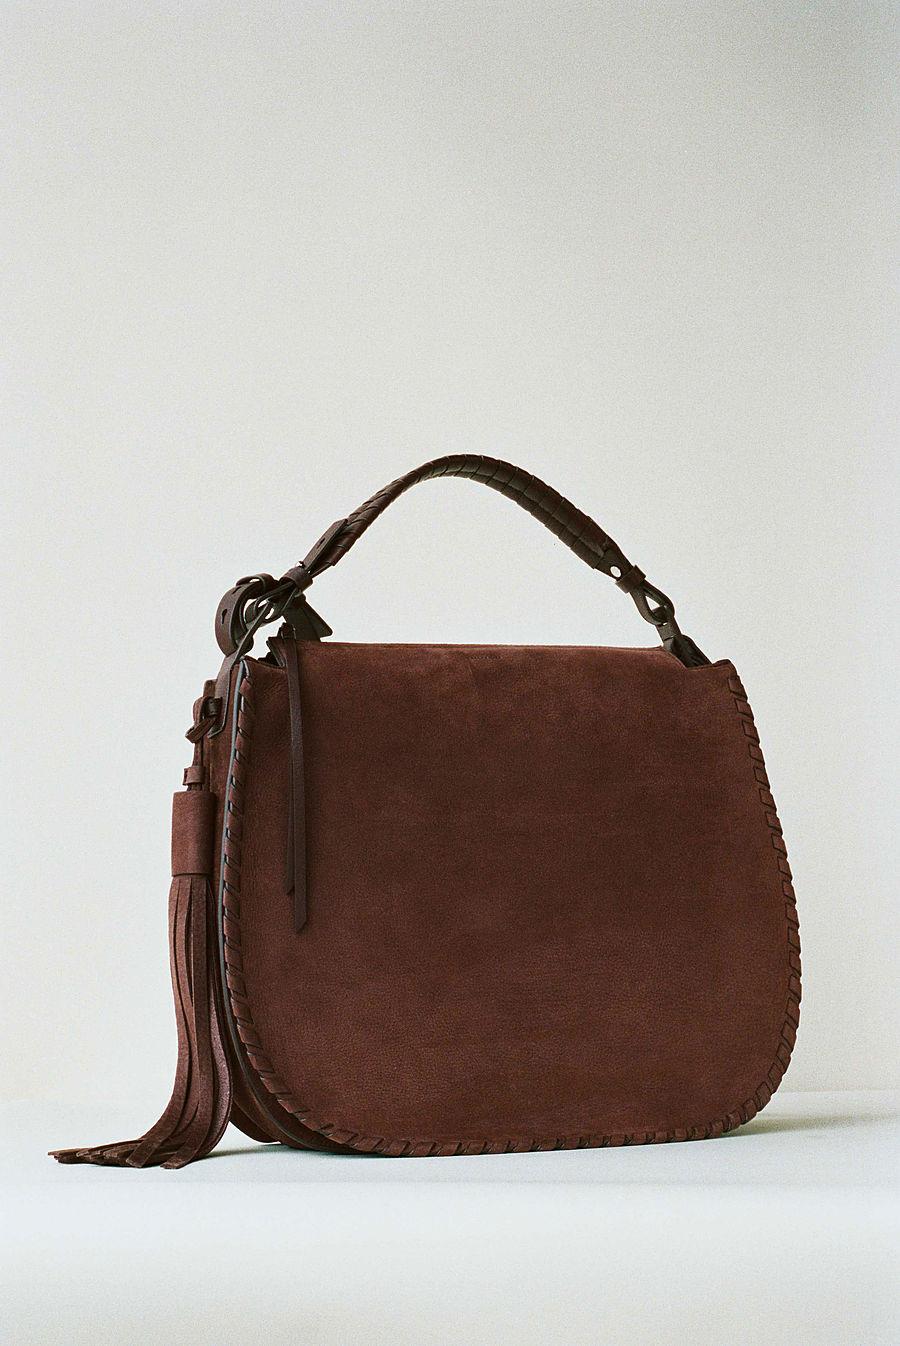 pretty nice sale uk uk store All Saints Leather Handbags | Jaguar Clubs of North America